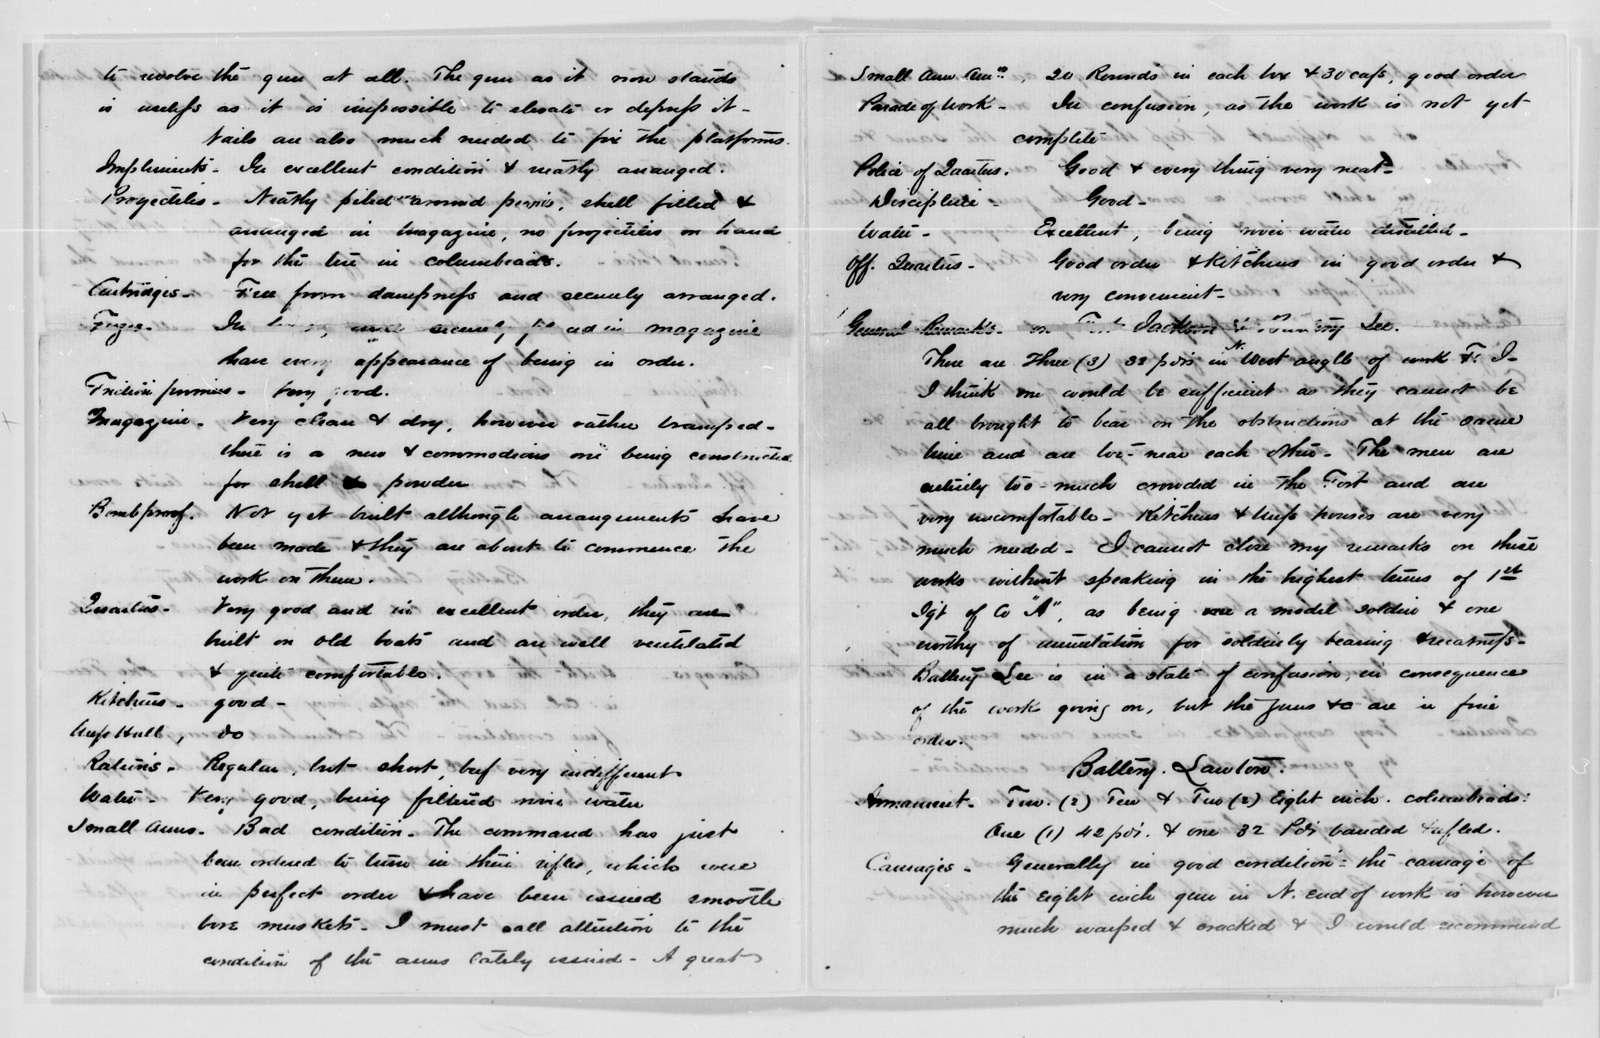 Confederate States of America records: Microfilm Reel 68